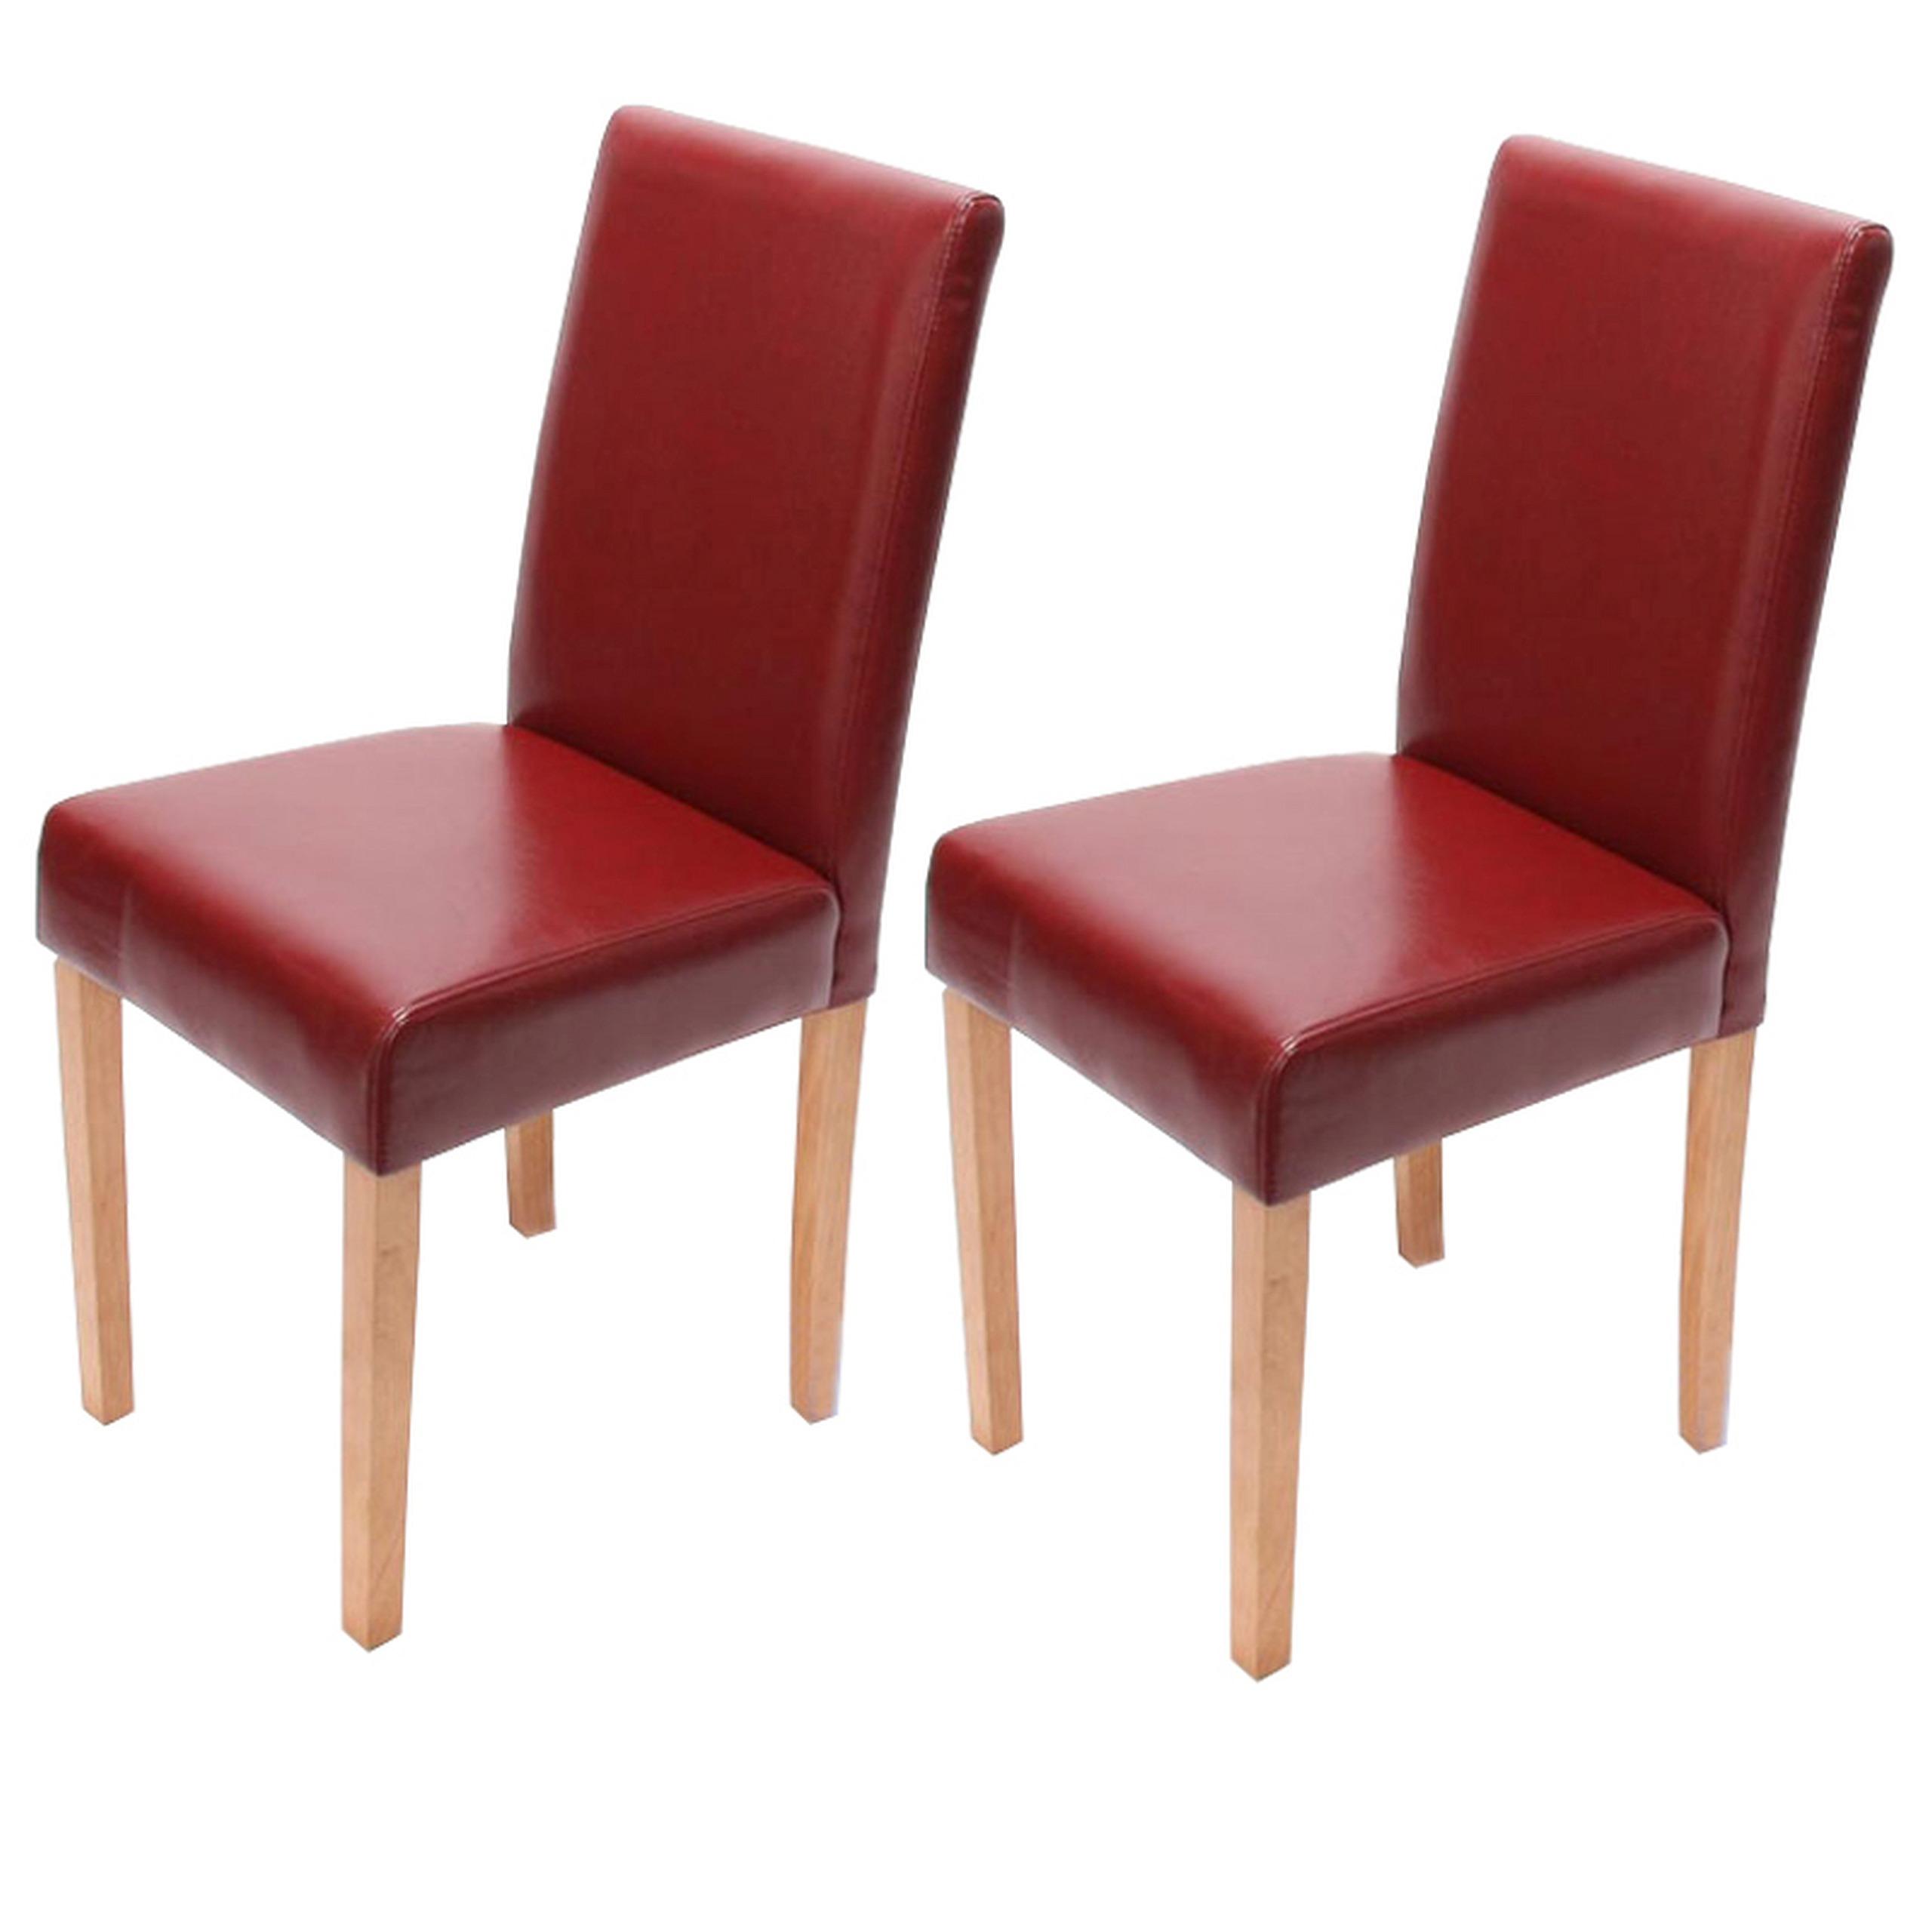 2x esszimmerstuhl lehnstuhl stuhl littau leder schwarz creme rot braun wei ebay. Black Bedroom Furniture Sets. Home Design Ideas